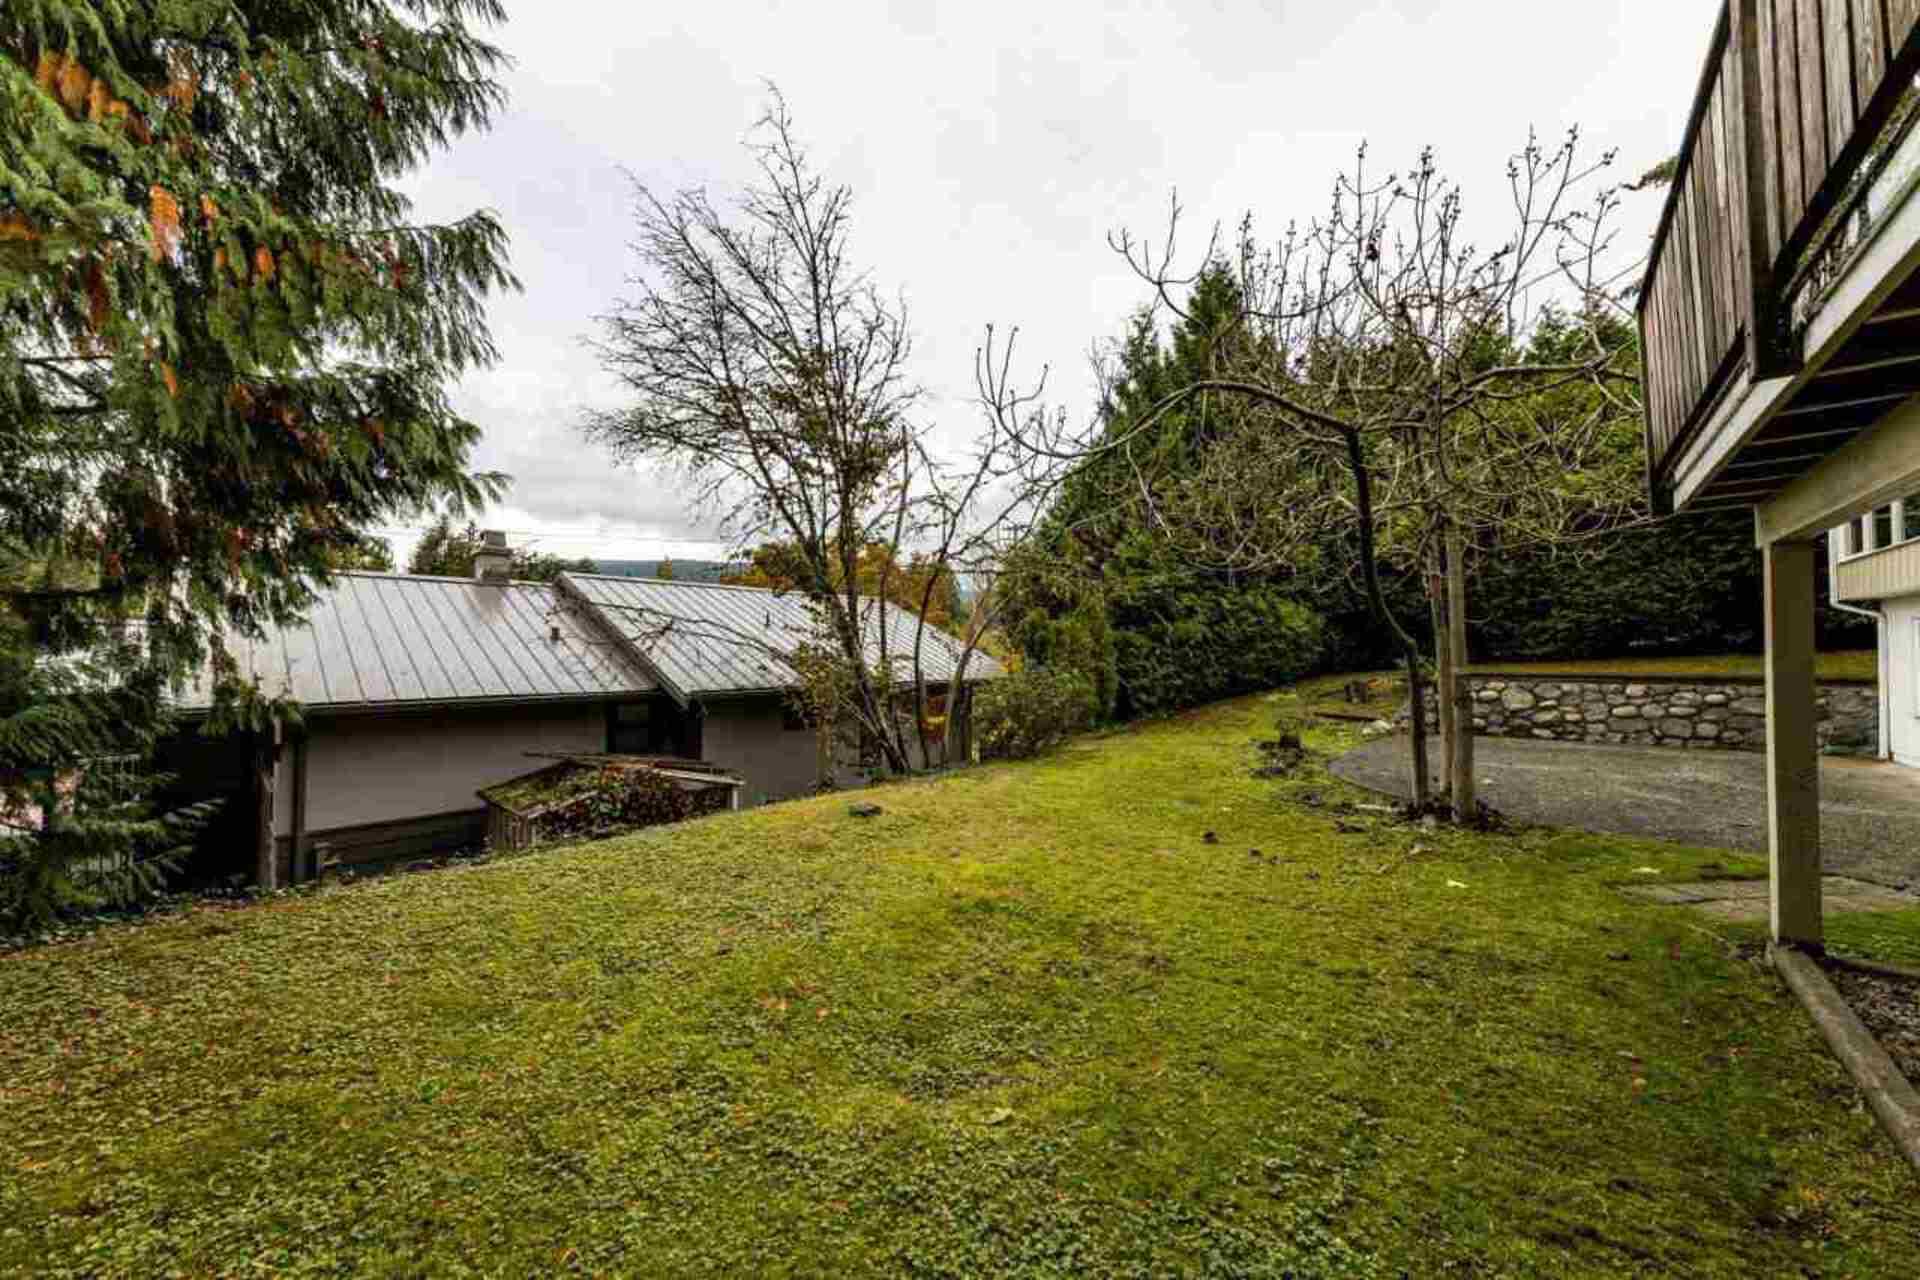 4363-highland-boulevard-forest-hills-nv-north-vancouver-25 at 4363 Highland Boulevard, Forest Hills NV, North Vancouver